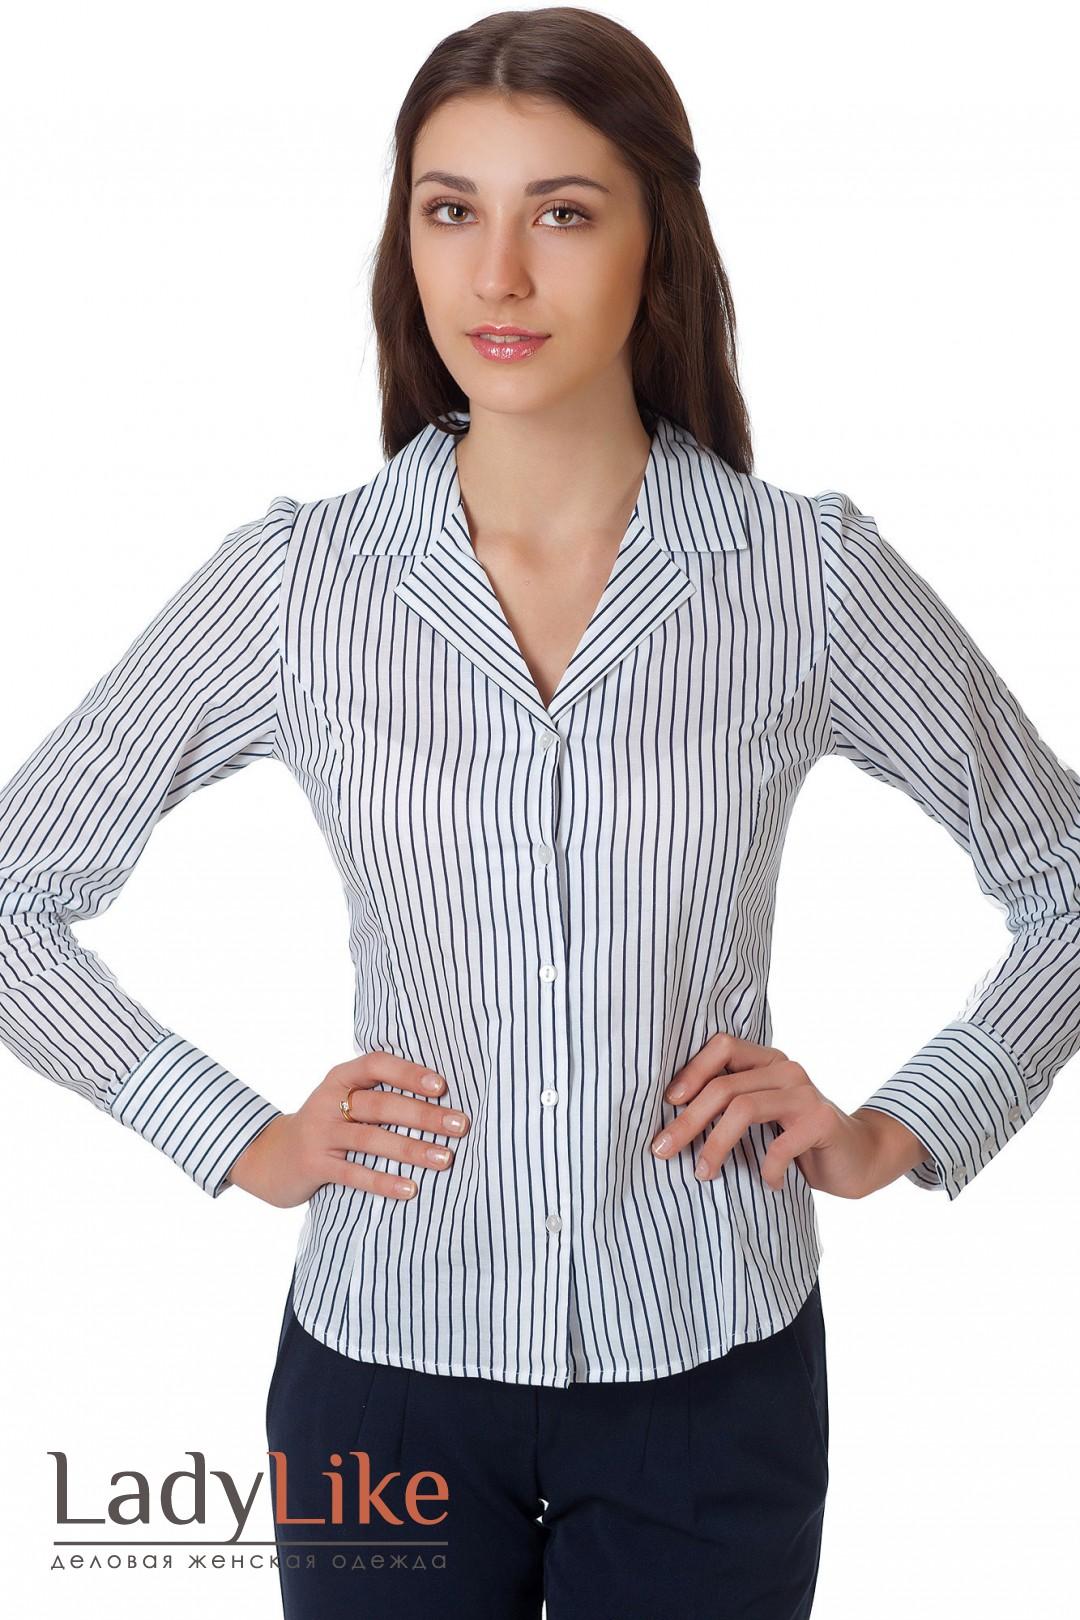 Весна сиреневая блузка в санкт петербурге